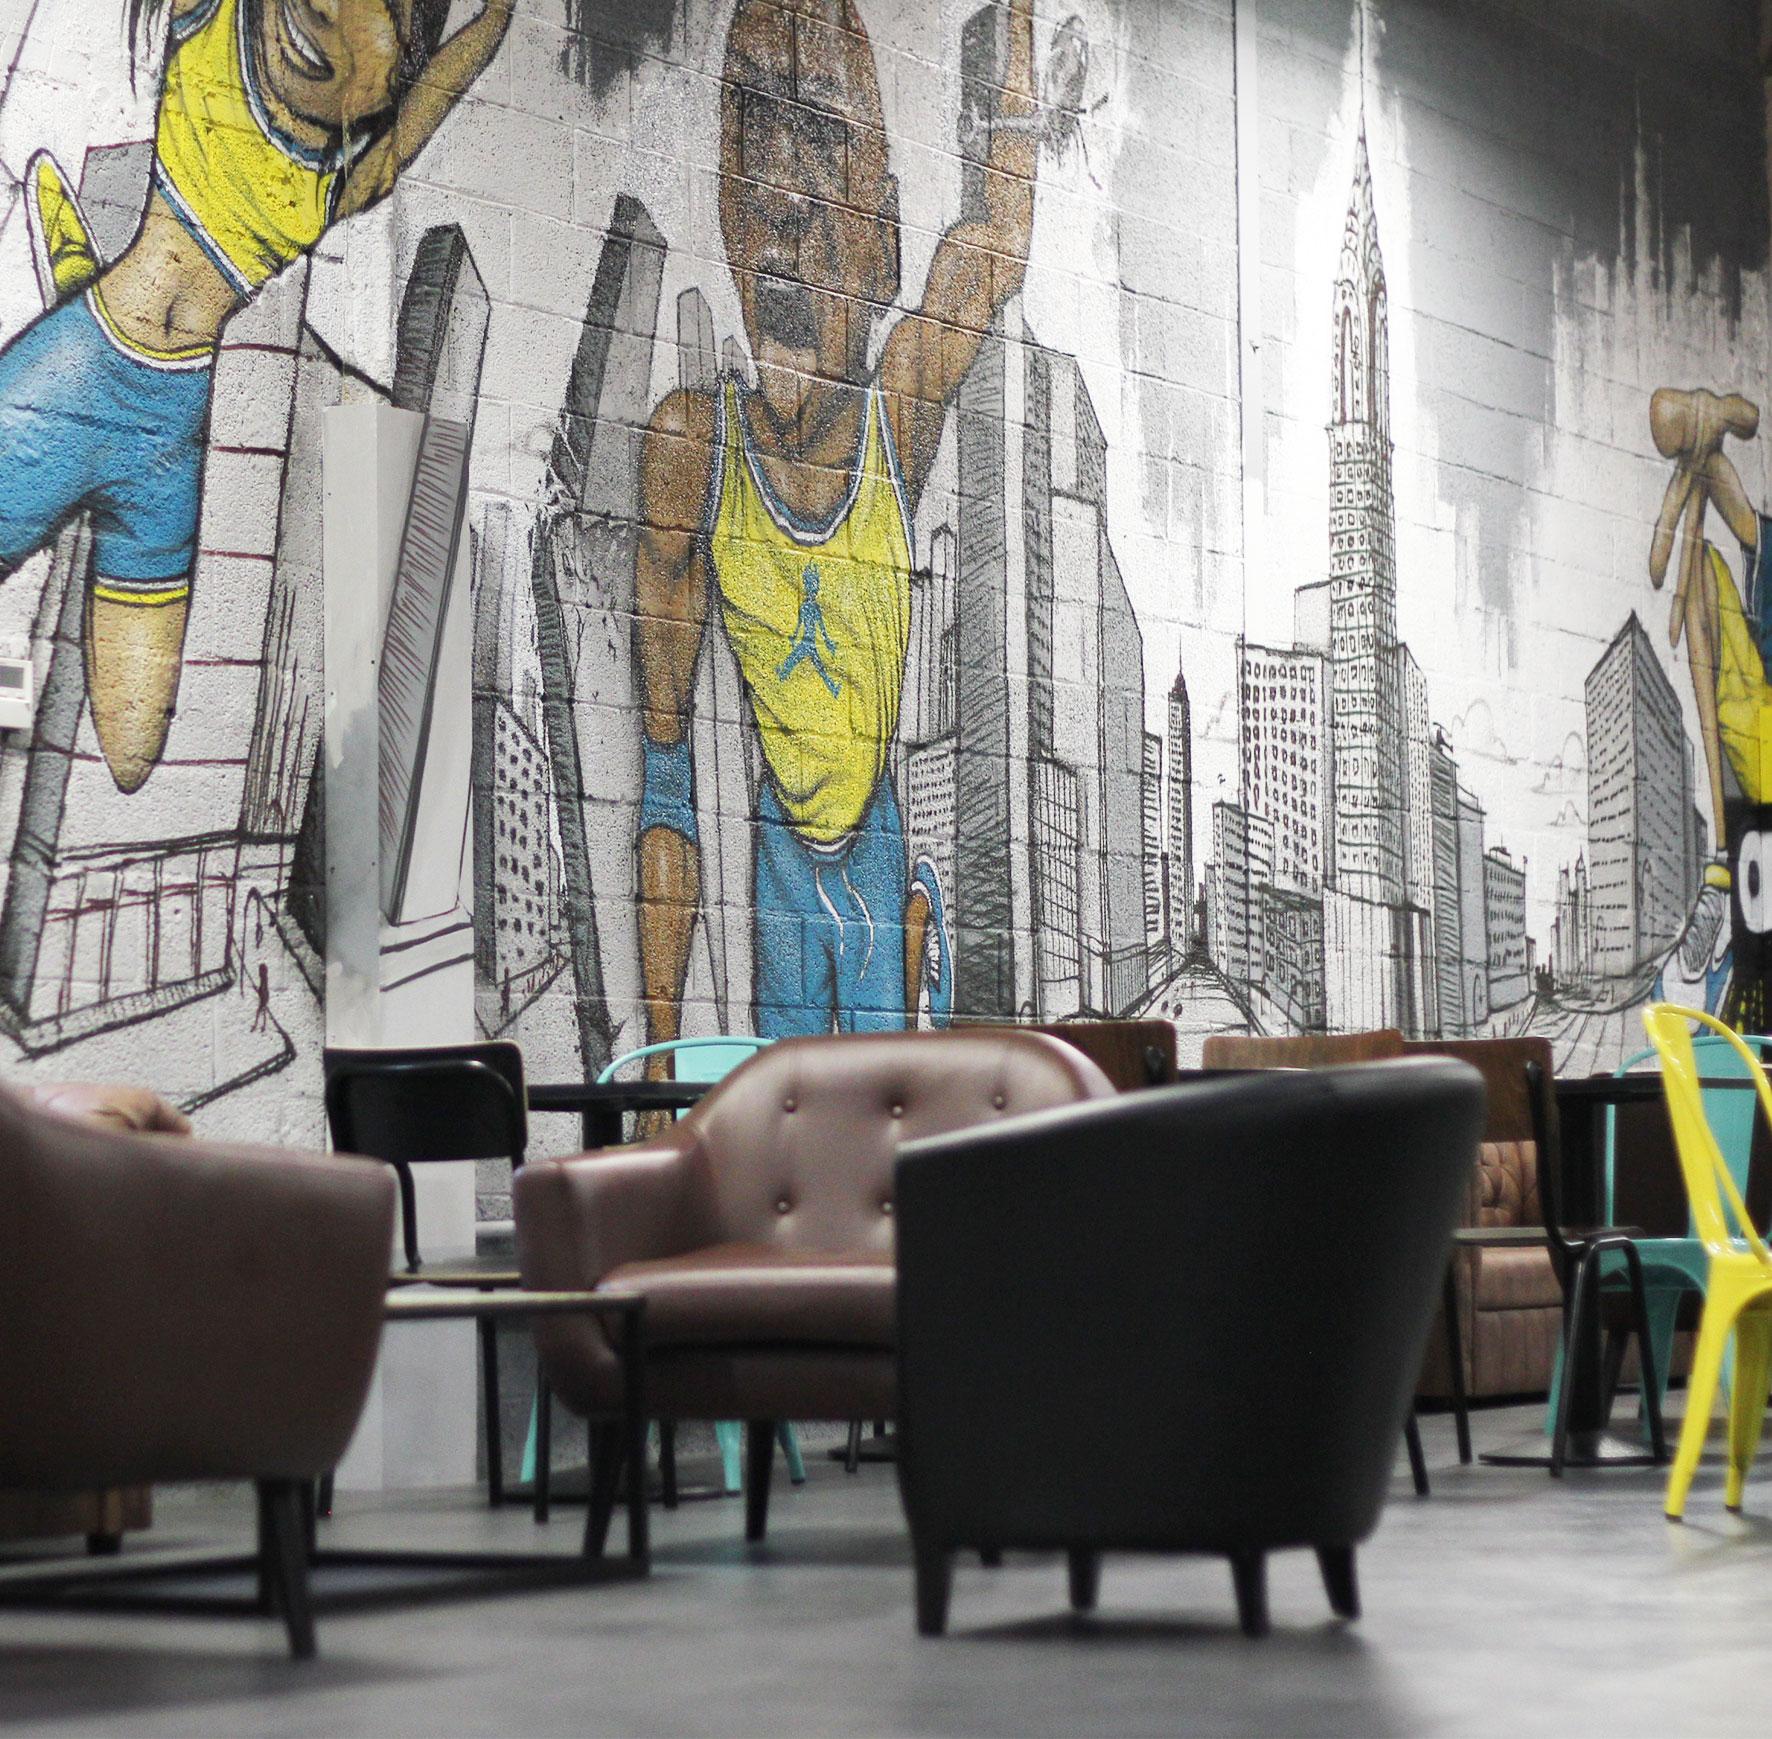 fresque graffiti street art cafétéria